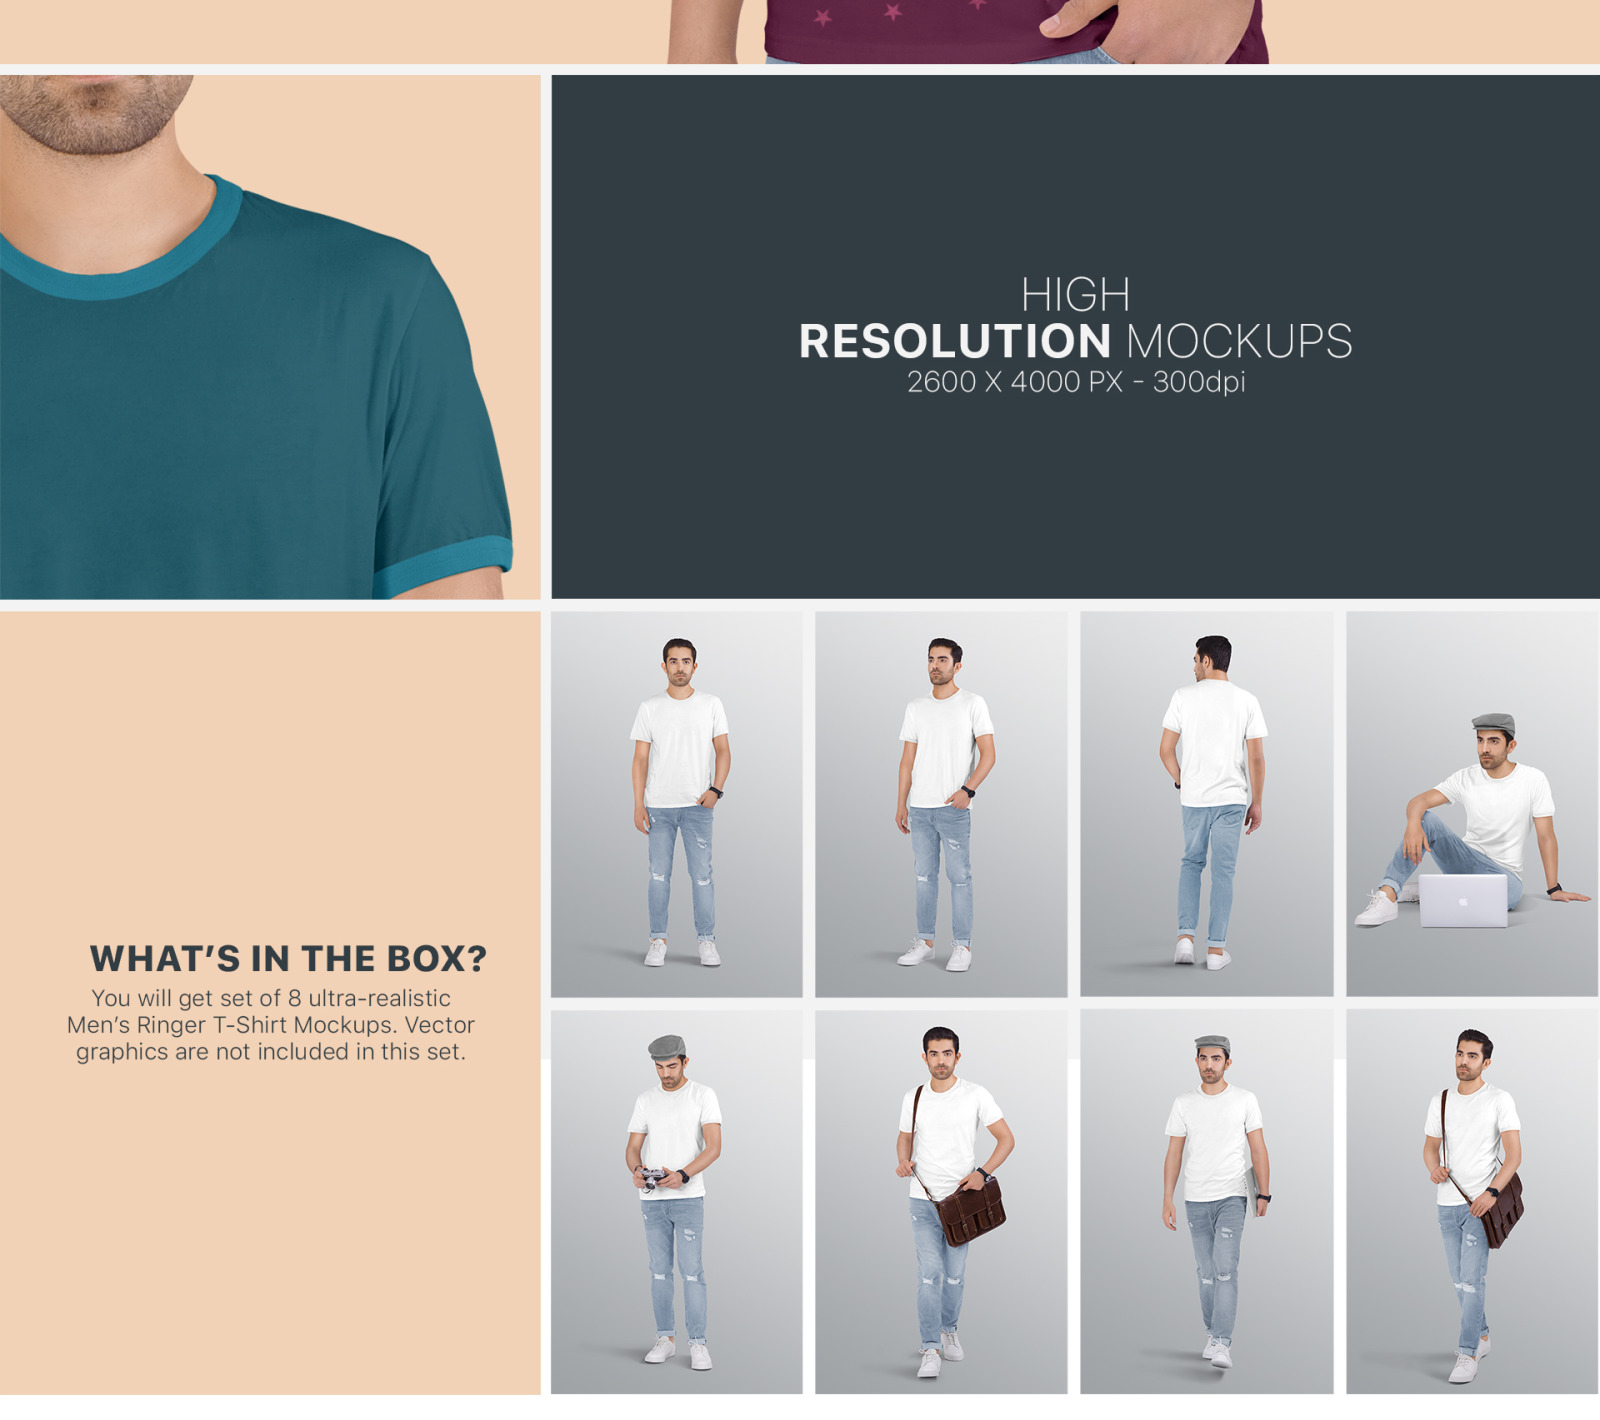 Men S Ringer T Shirt Mockup Set In Apparel Mockups On Yellow